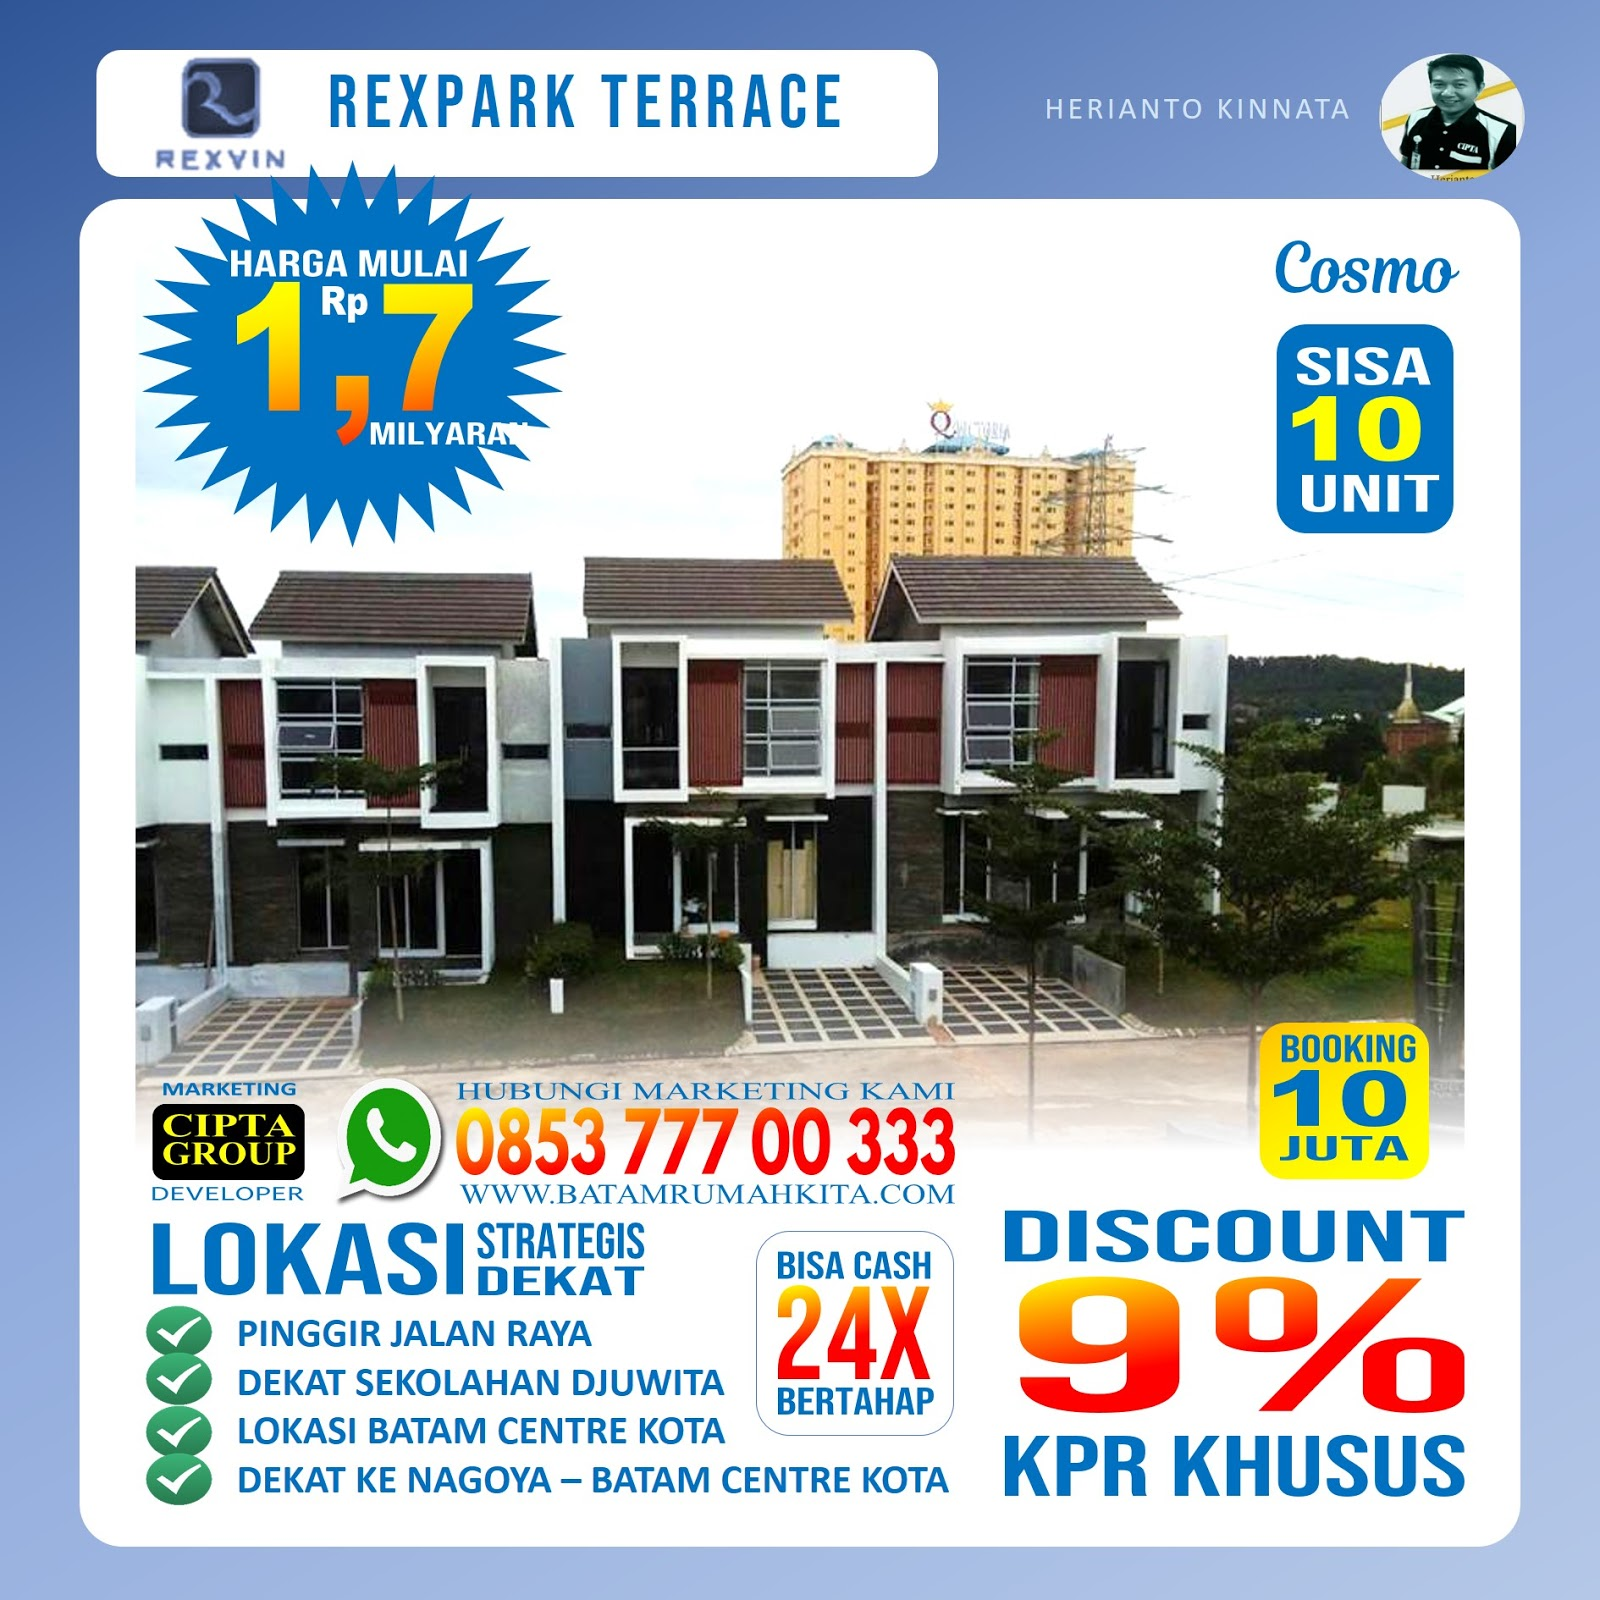 Perumahan Rexpark Terrace - Type cosmo -2